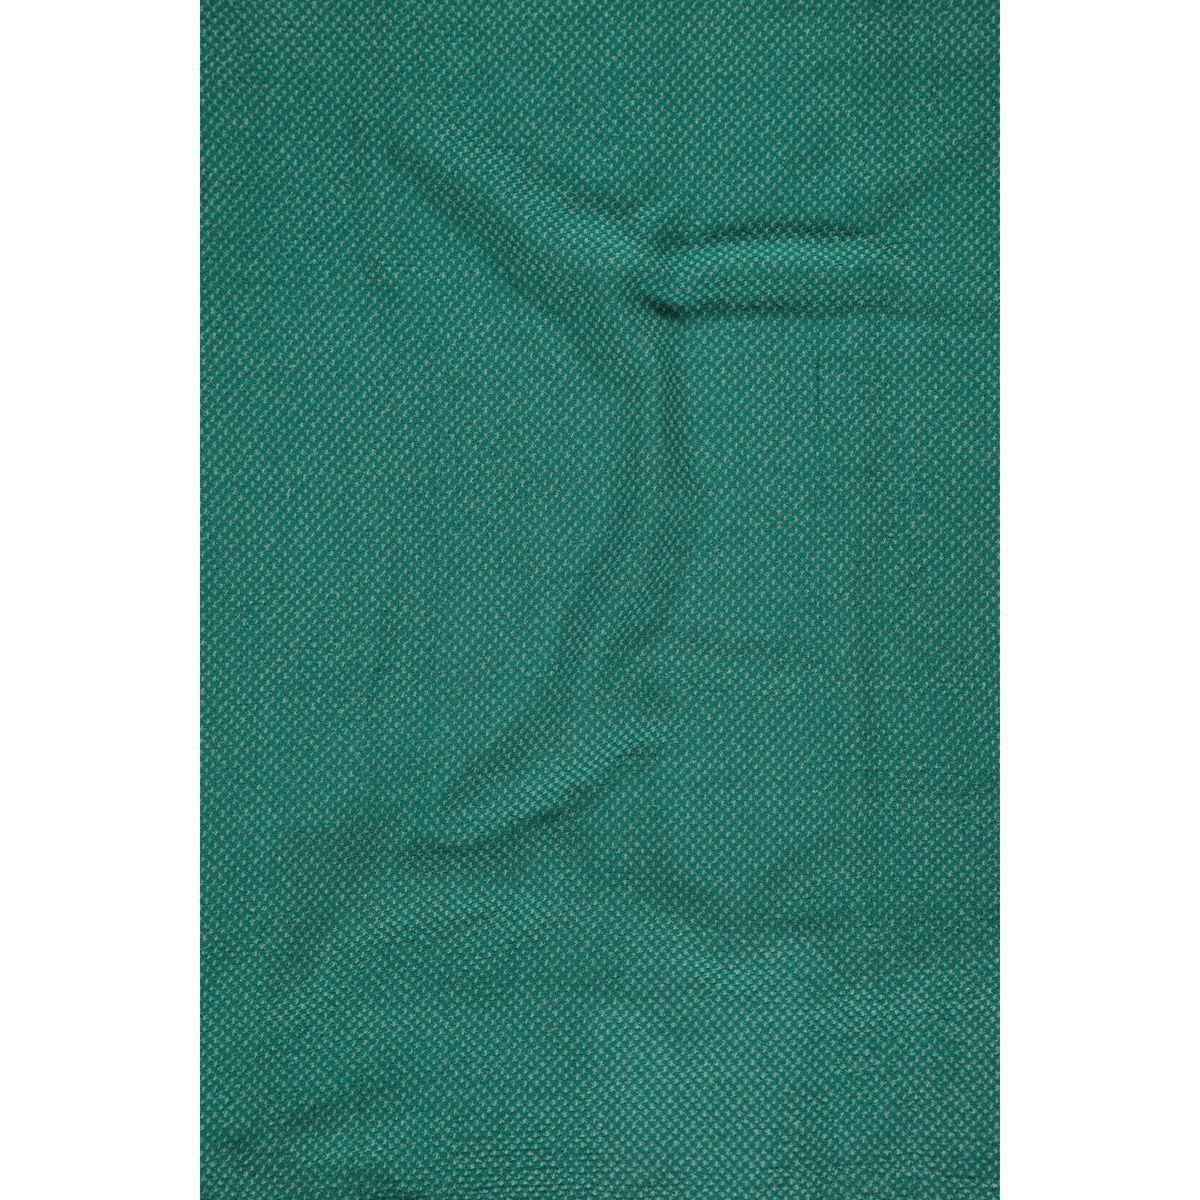 Peshtemal Dama - Fanfare Green